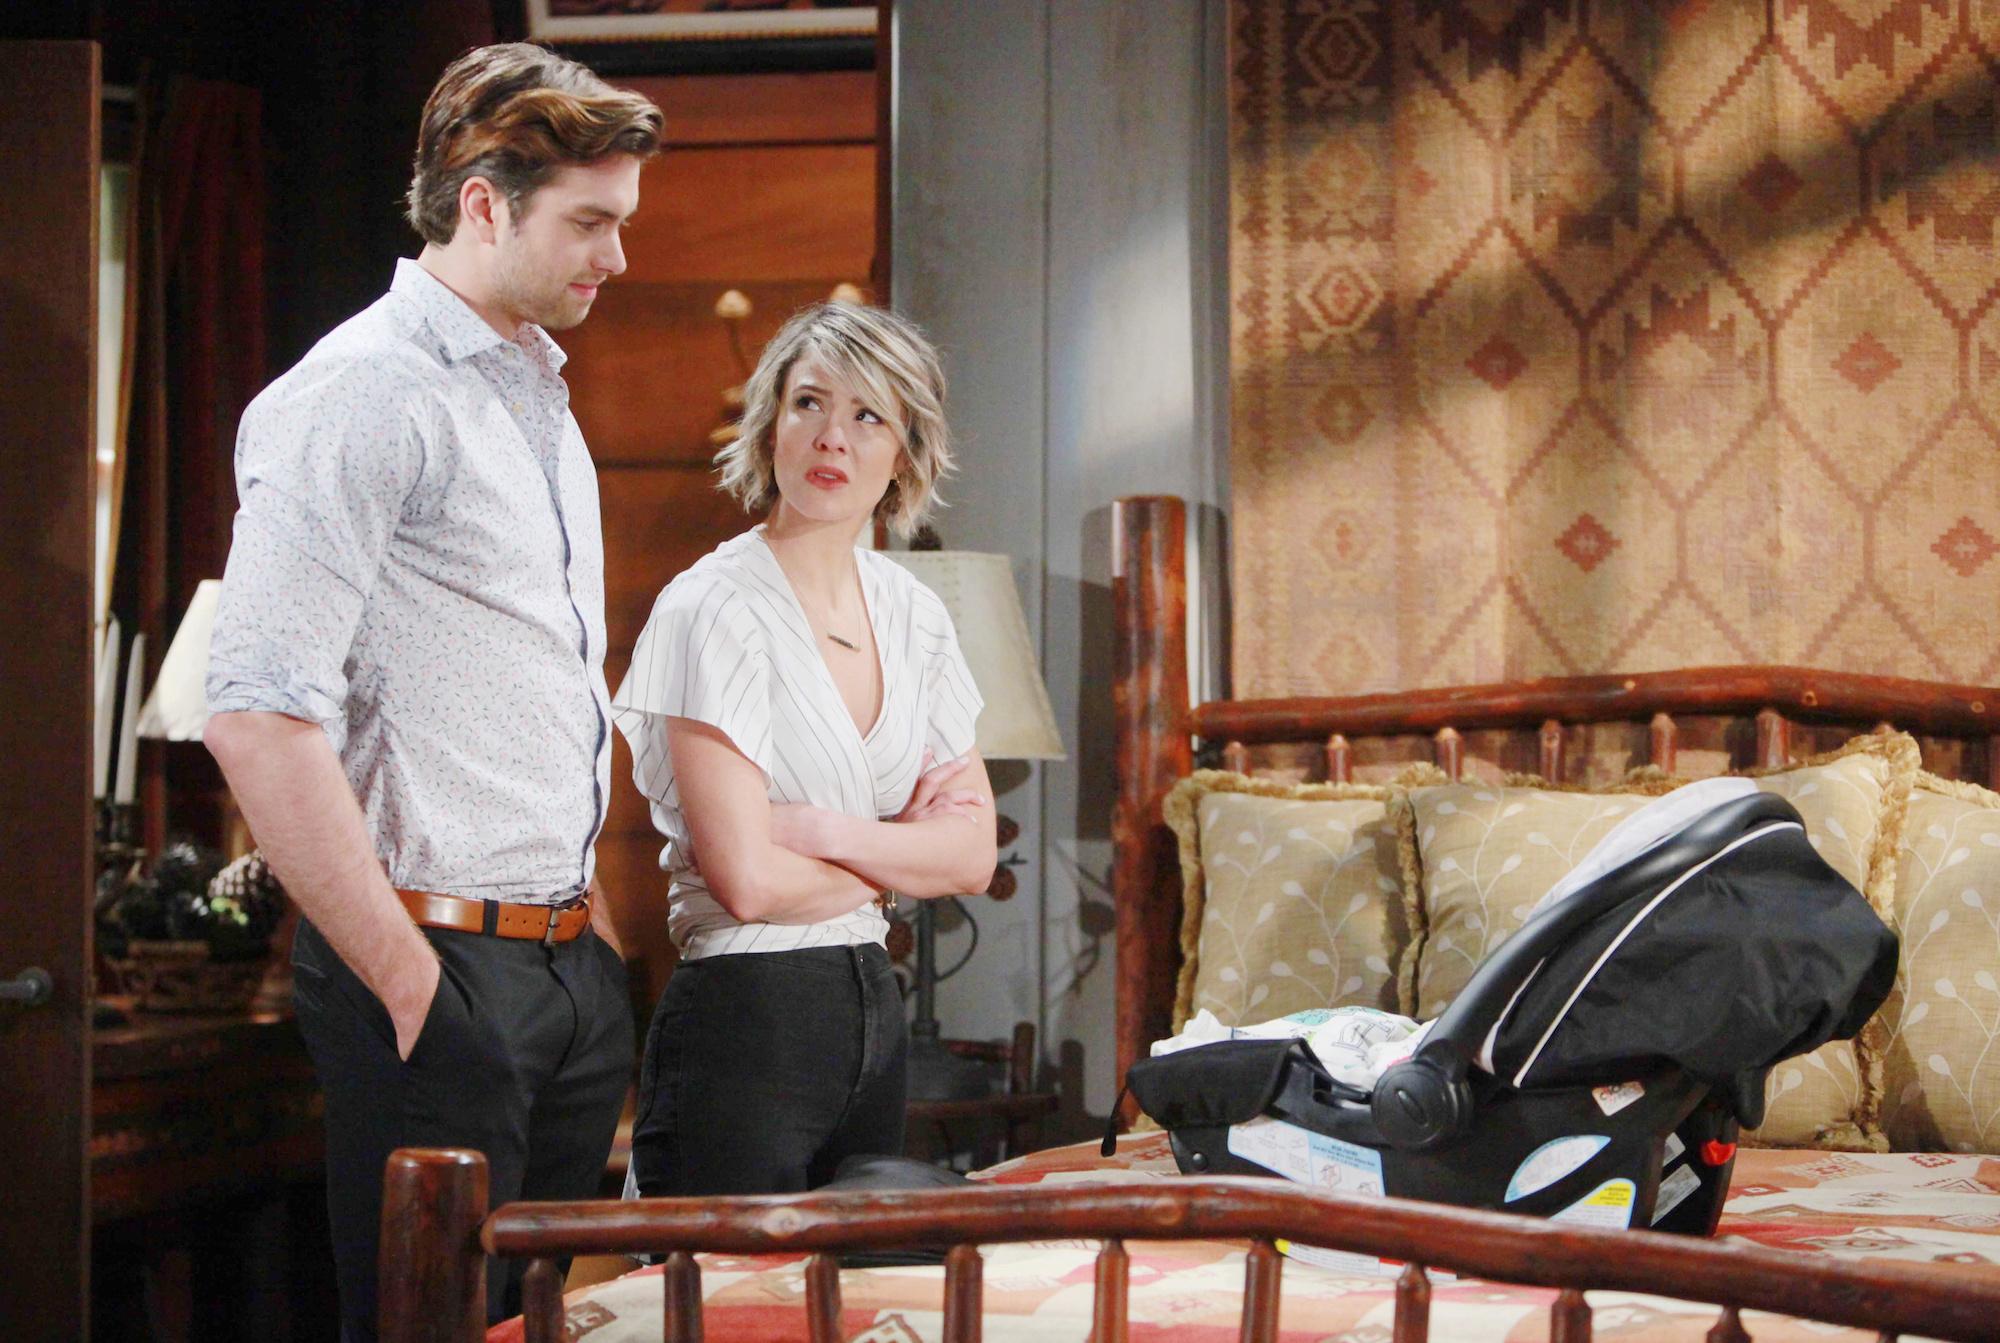 Caroline pleads for Thomas to reconsider.